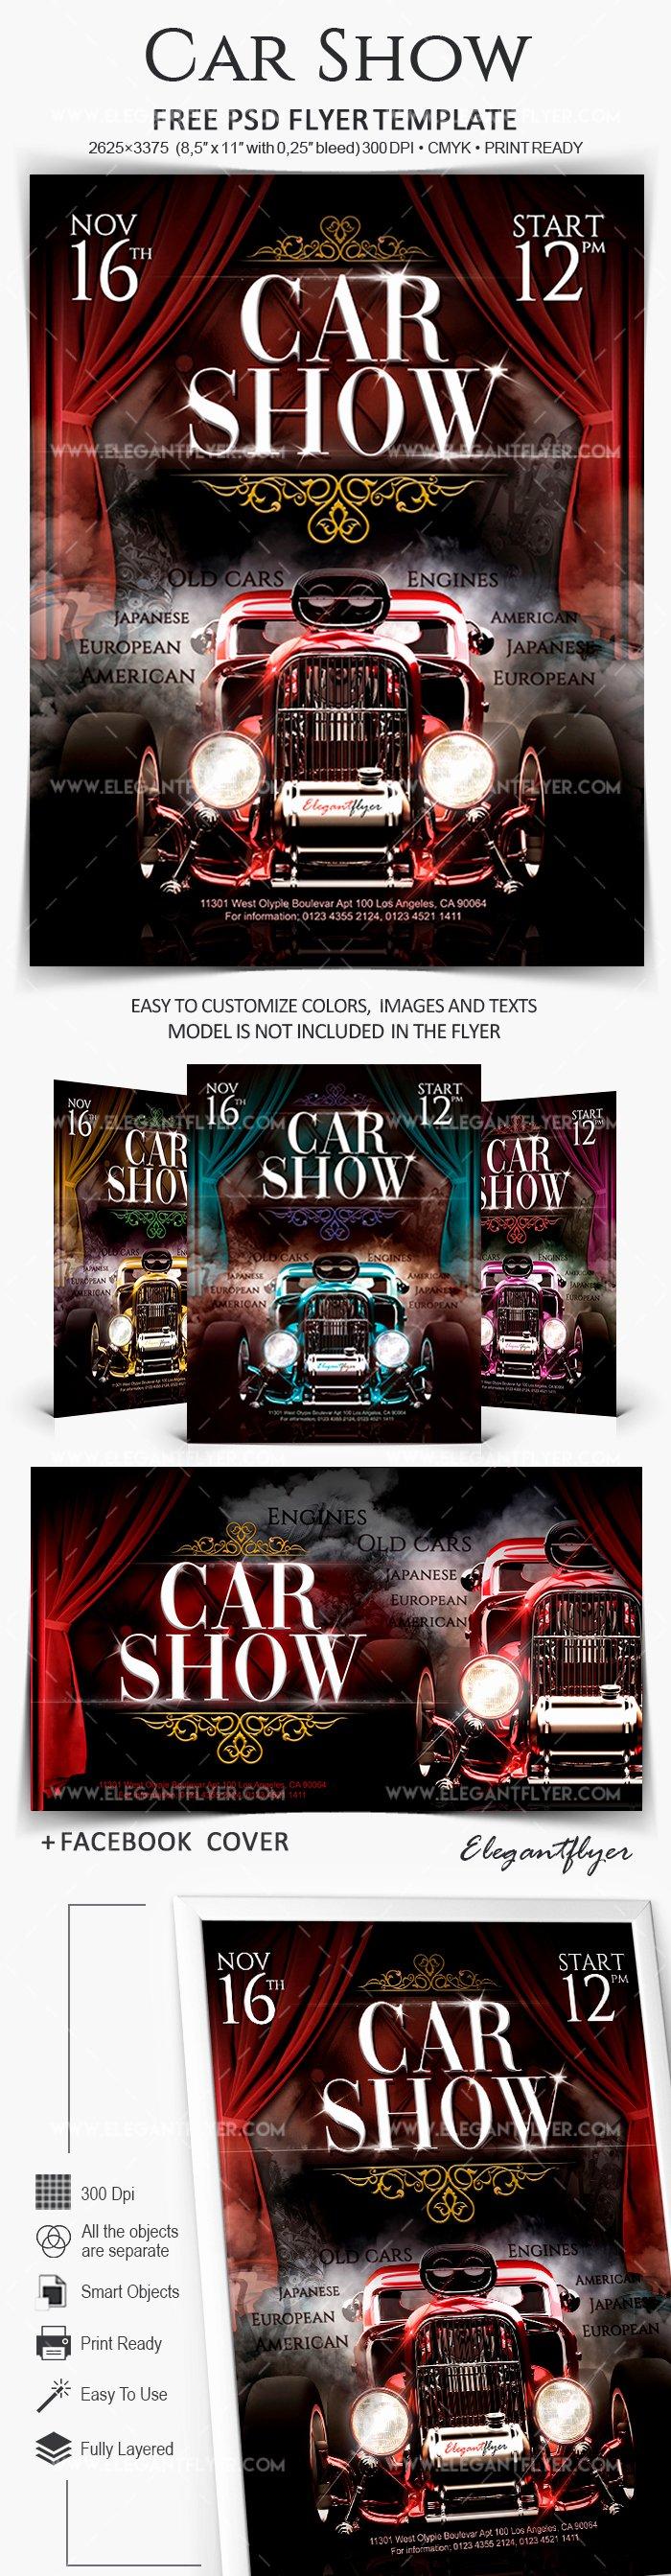 Car Show Flyer Template Best Of Car Show – Free Flyer Psd Template – by Elegantflyer